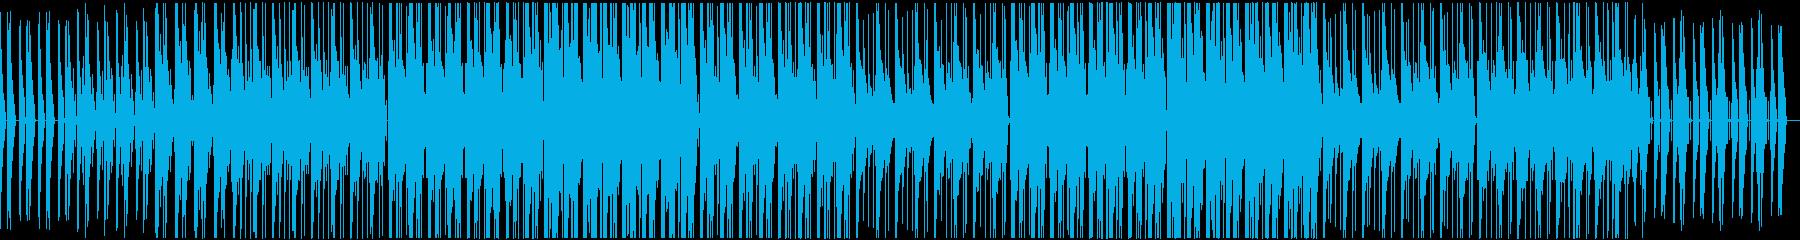 Vlog 映像作品 おしゃれなBGMの再生済みの波形